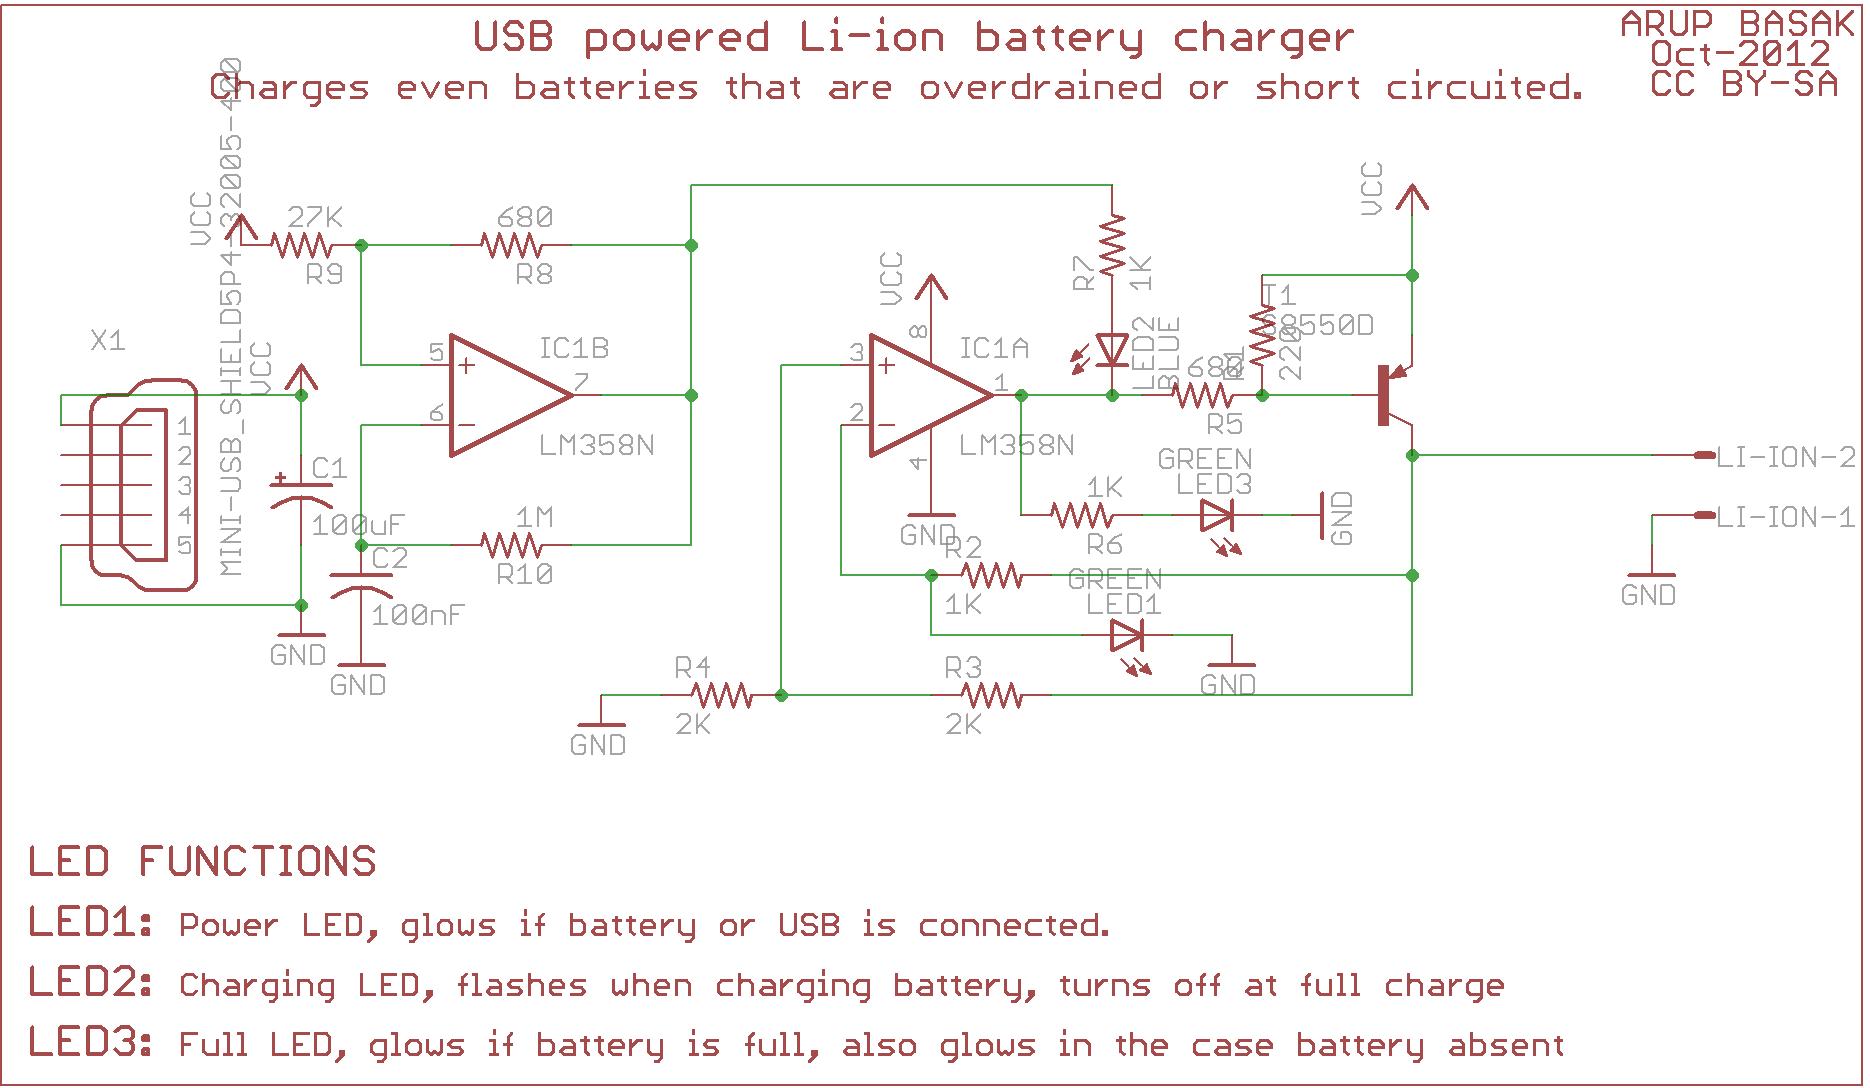 hight resolution of 115 vac schematic usb power chargers wiring library 115 vac schematic usb power chargers